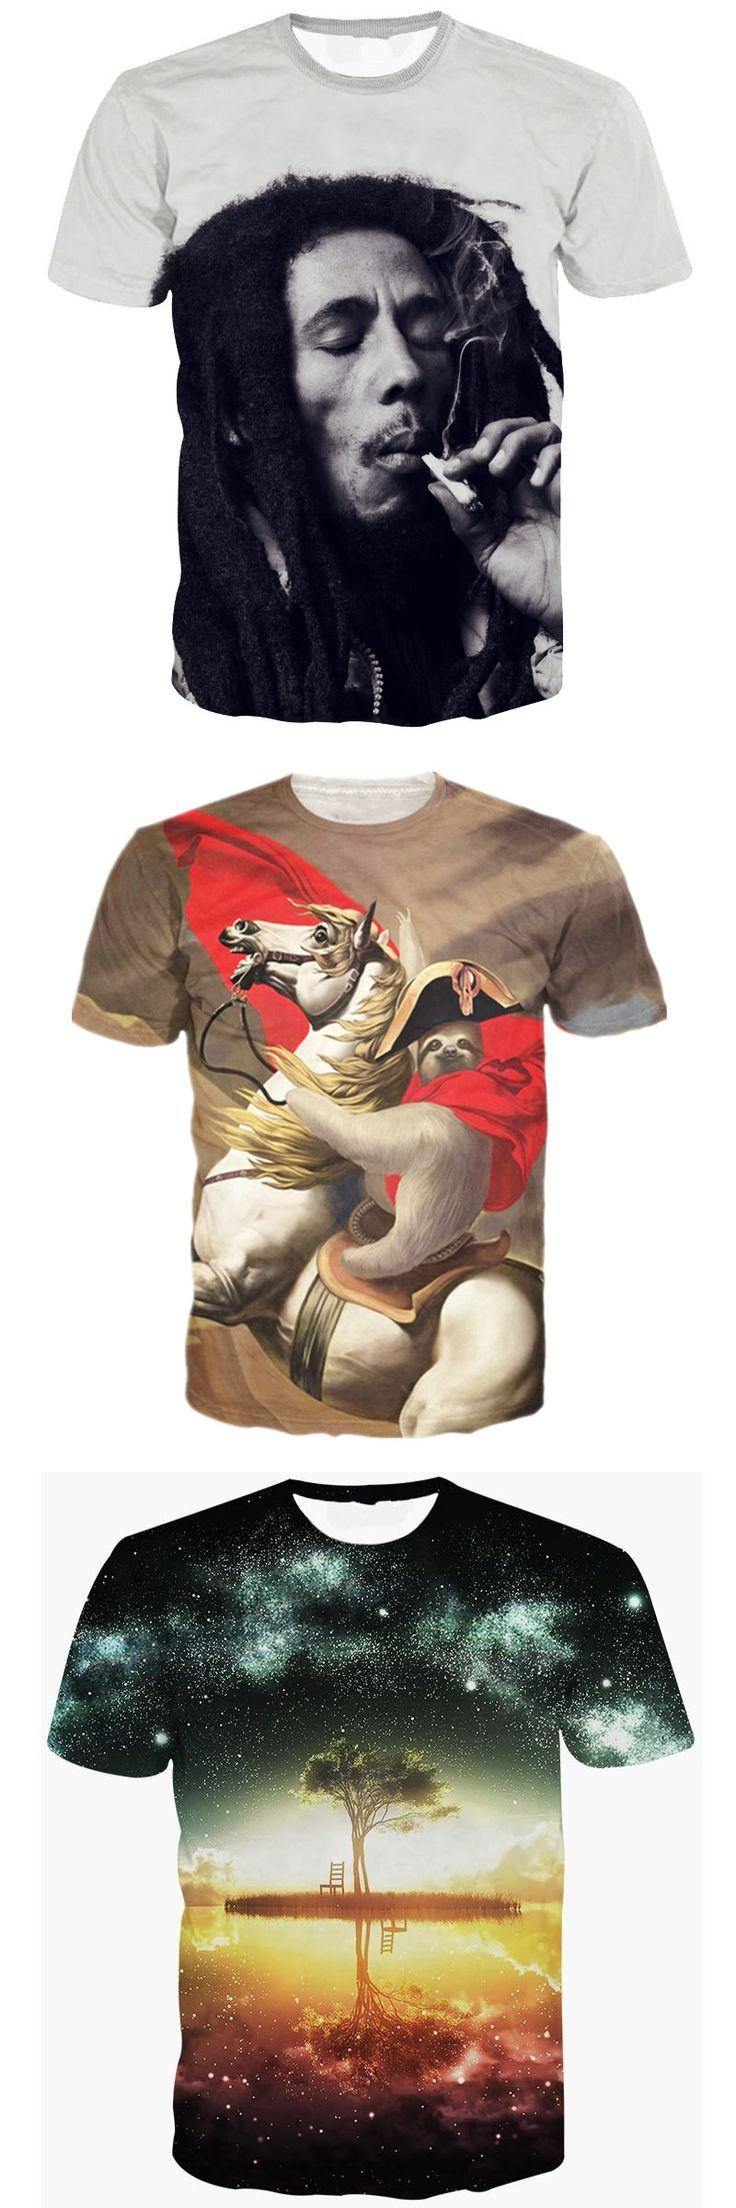 Bob Marley T-shirt Men Women Harajuku 3D Print T-shirt Funny Brand Clothing Summer Tops Tees Hip Hop T Shirts Dropship